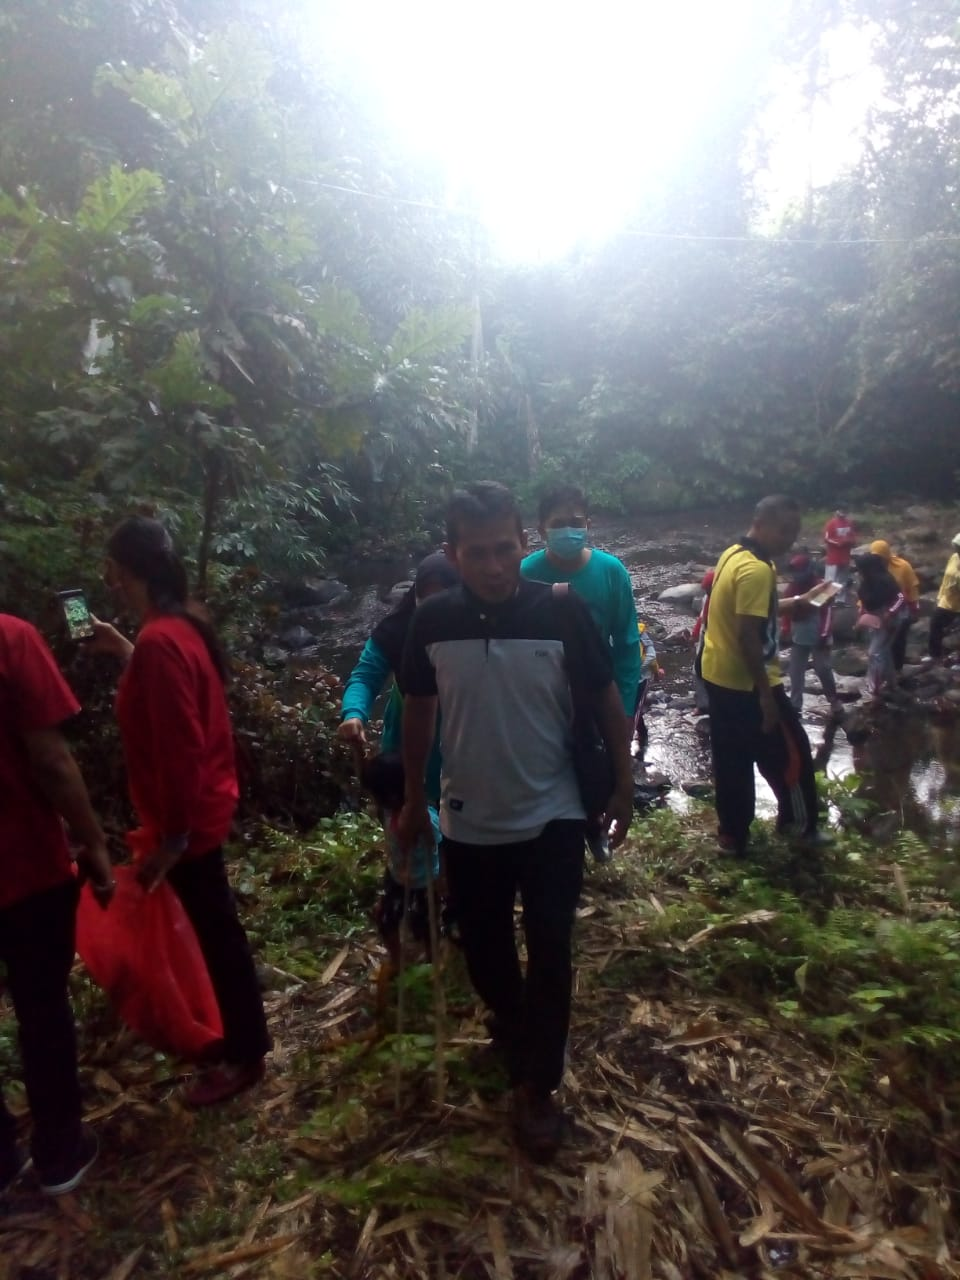 Giat Susur Sungai Desa Ranulogong Kec Randuagung